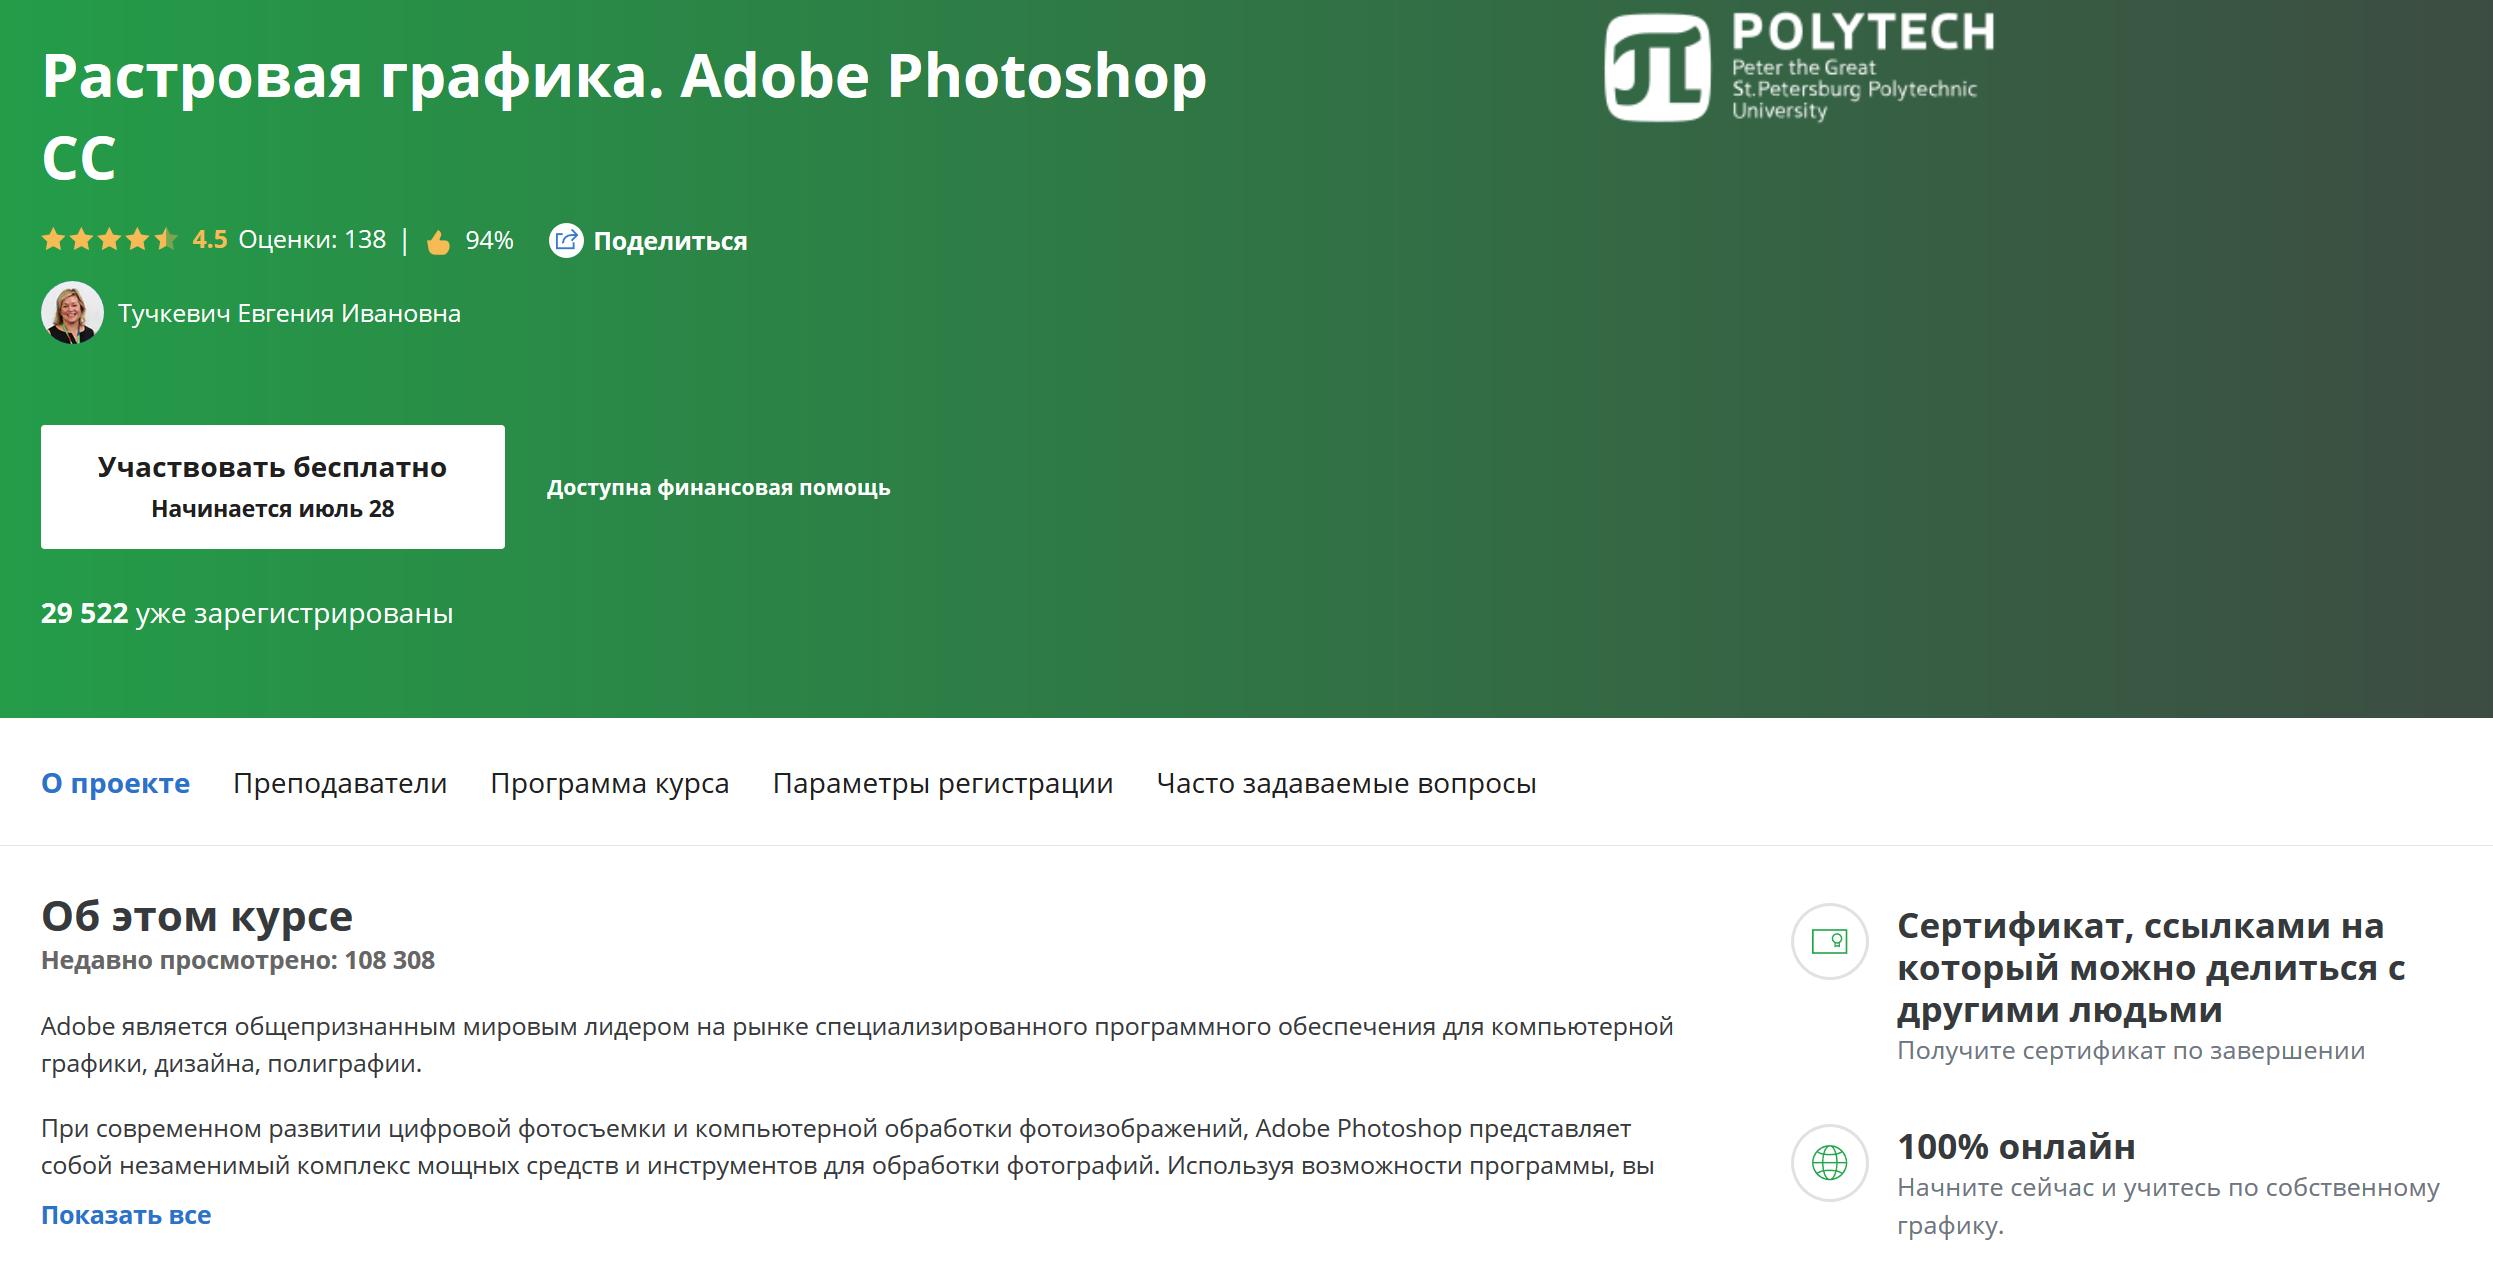 Растровая графика. Adobe Photoshop CC Coursera